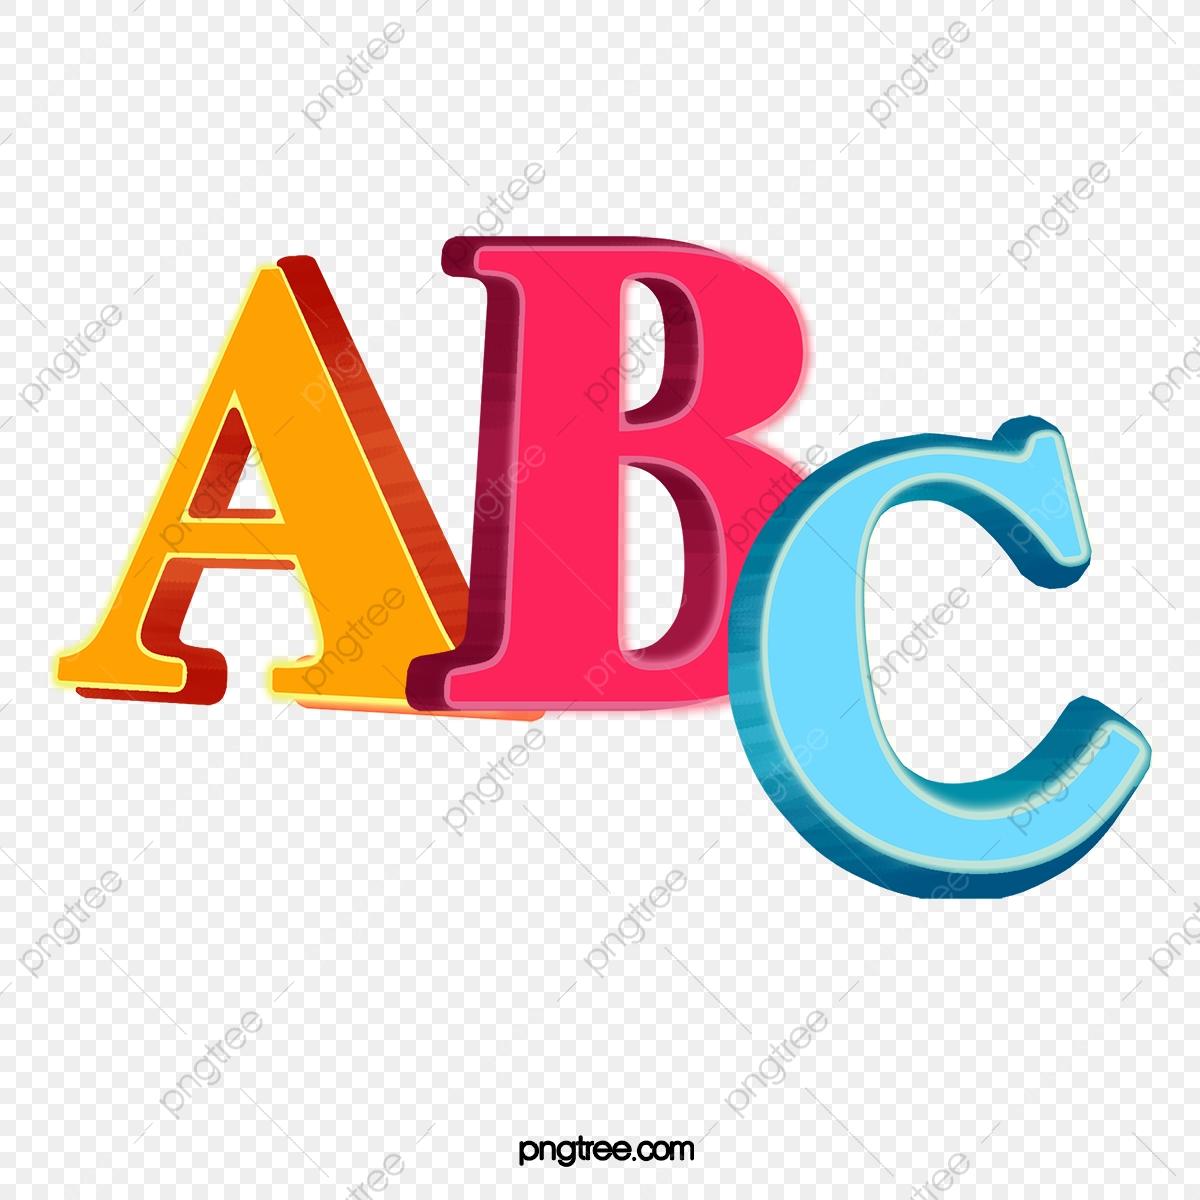 English clipart resource. Abc letter png transparent